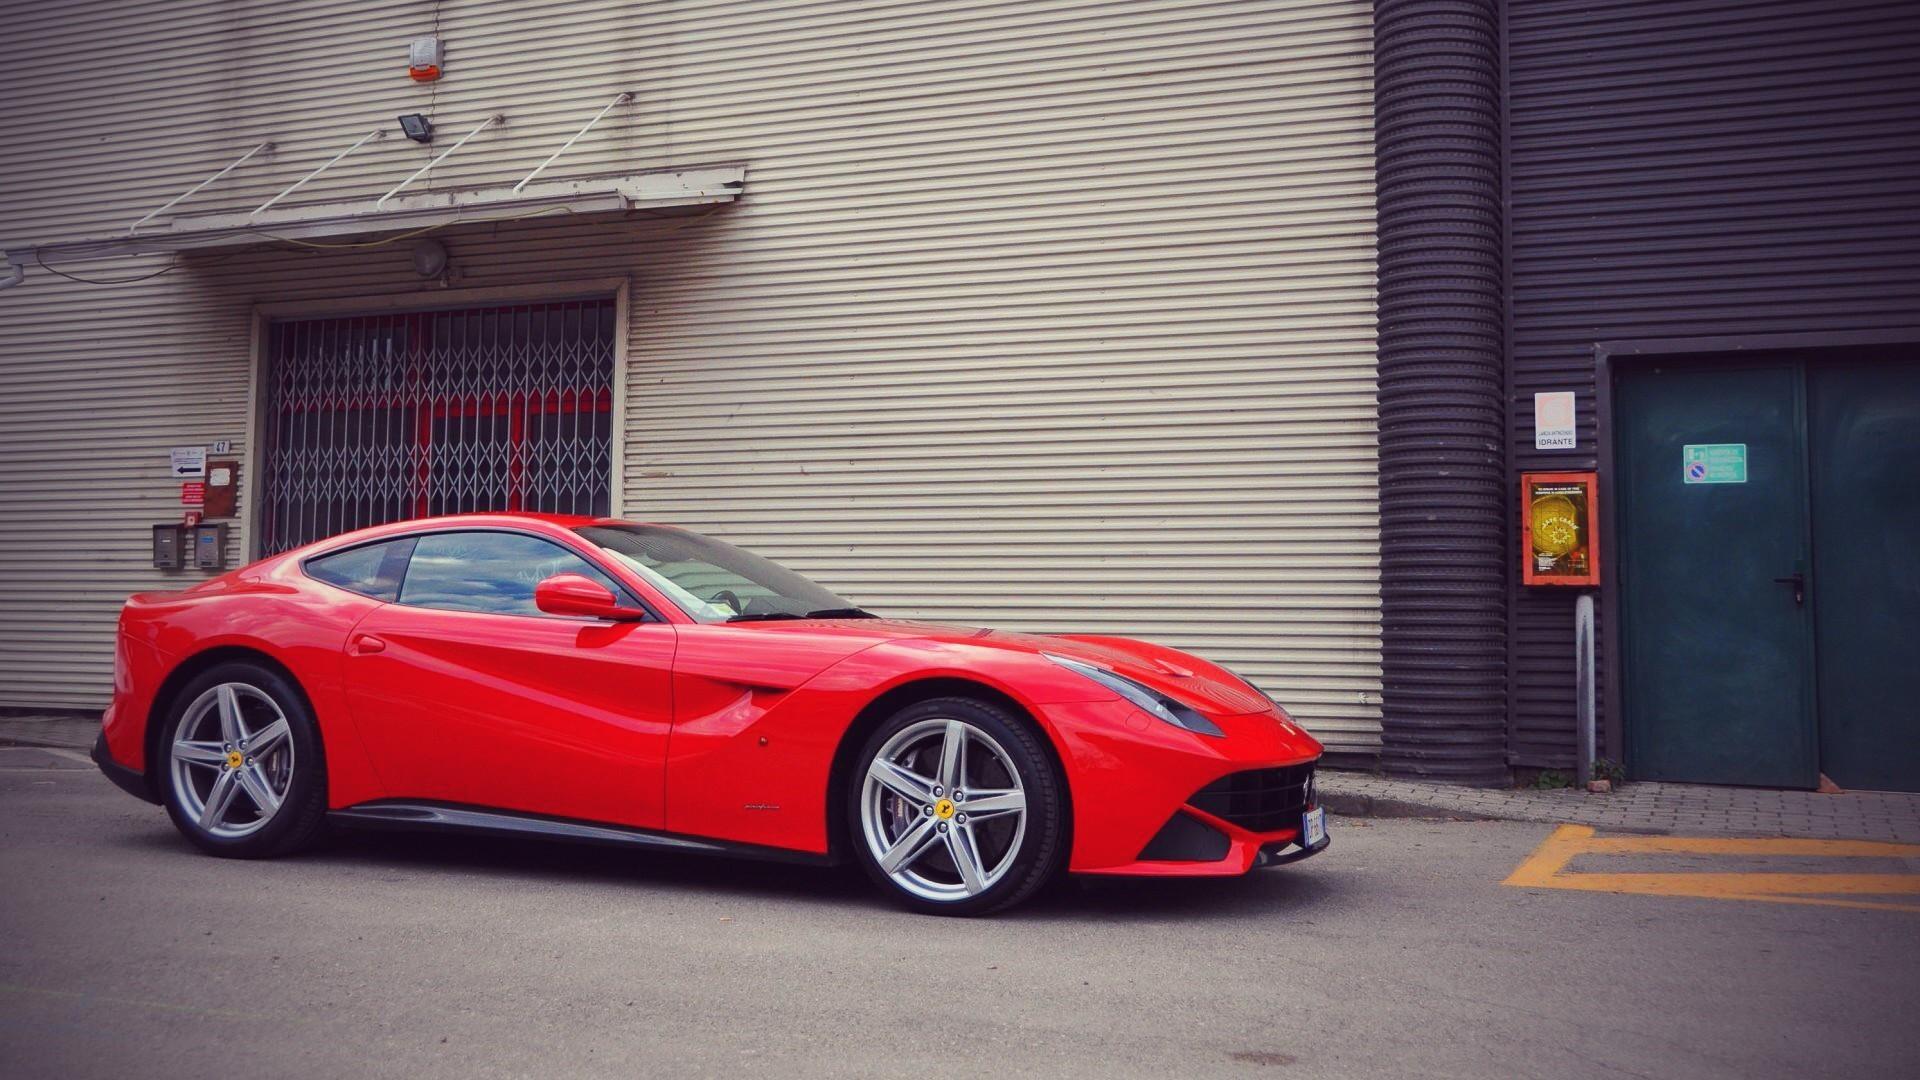 Ferrari F12 Berlinetta спорткар  № 553377  скачать